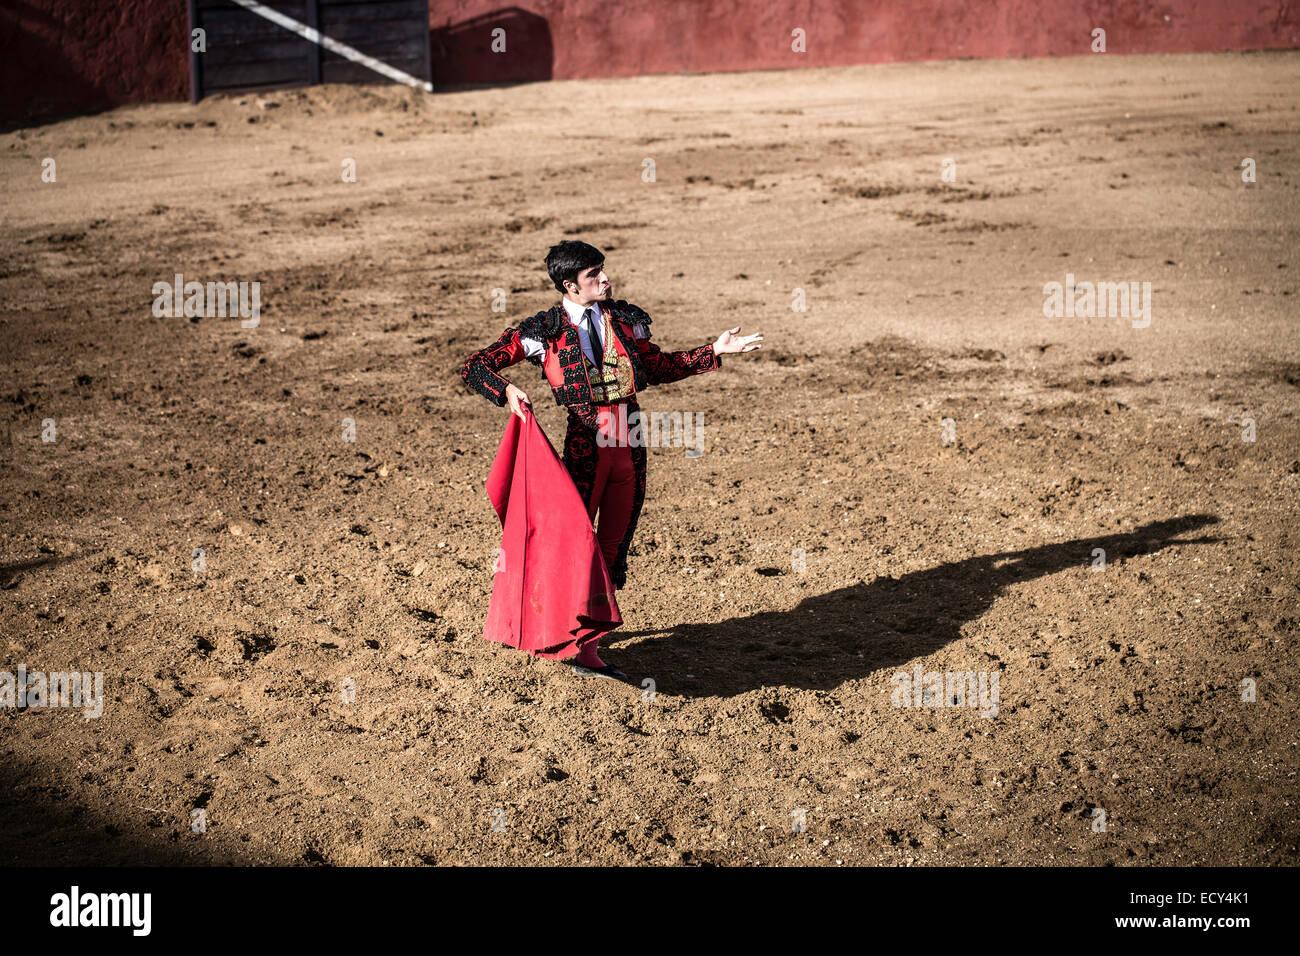 Bullfighter, bullfighting, El Barco de Avila, Avila, Spain Stock Photo